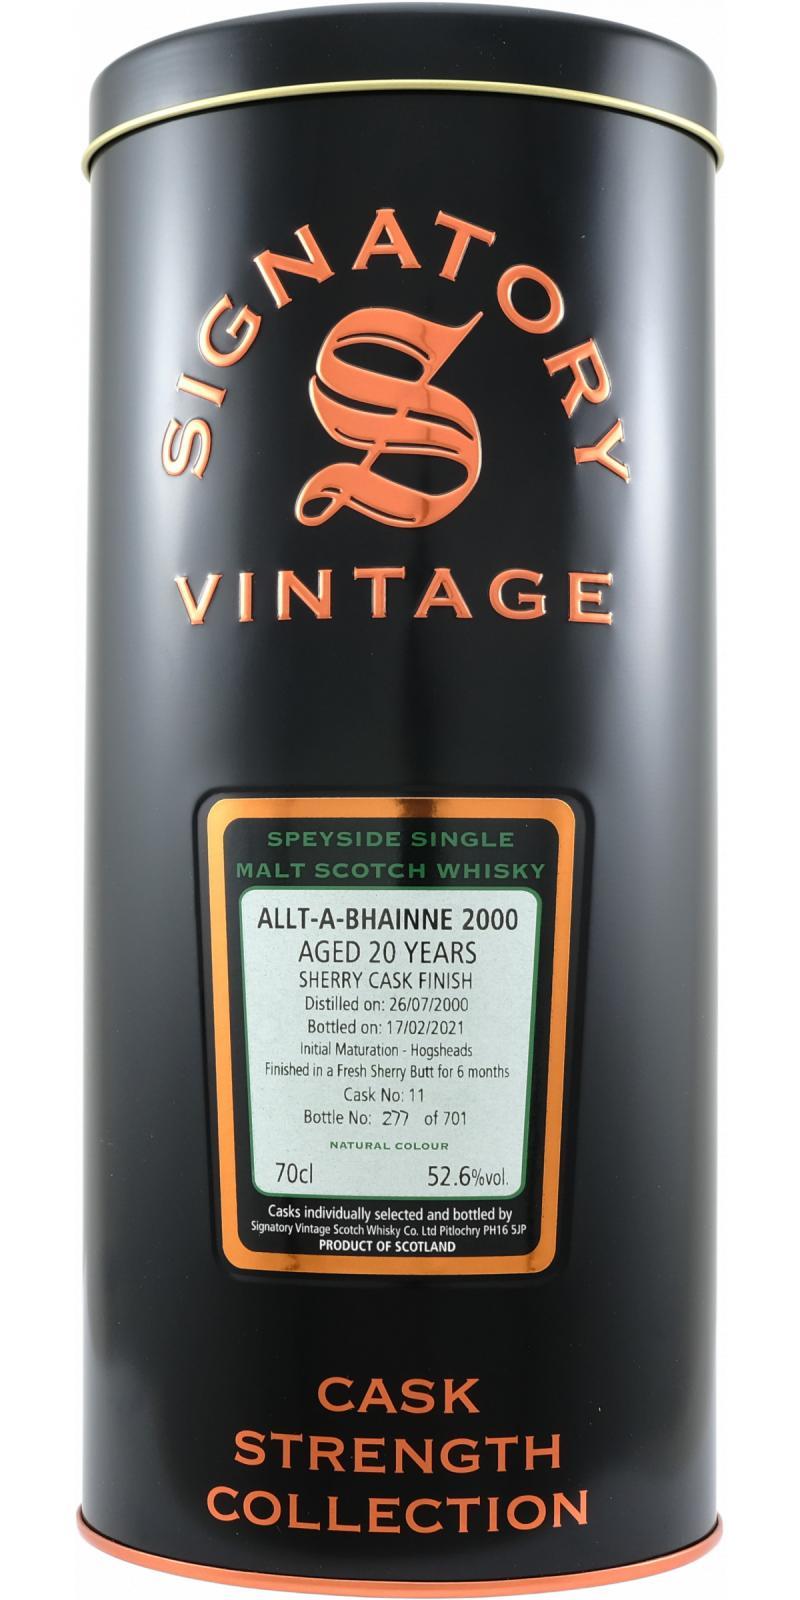 Allt-a-Bhainne 2000 SV